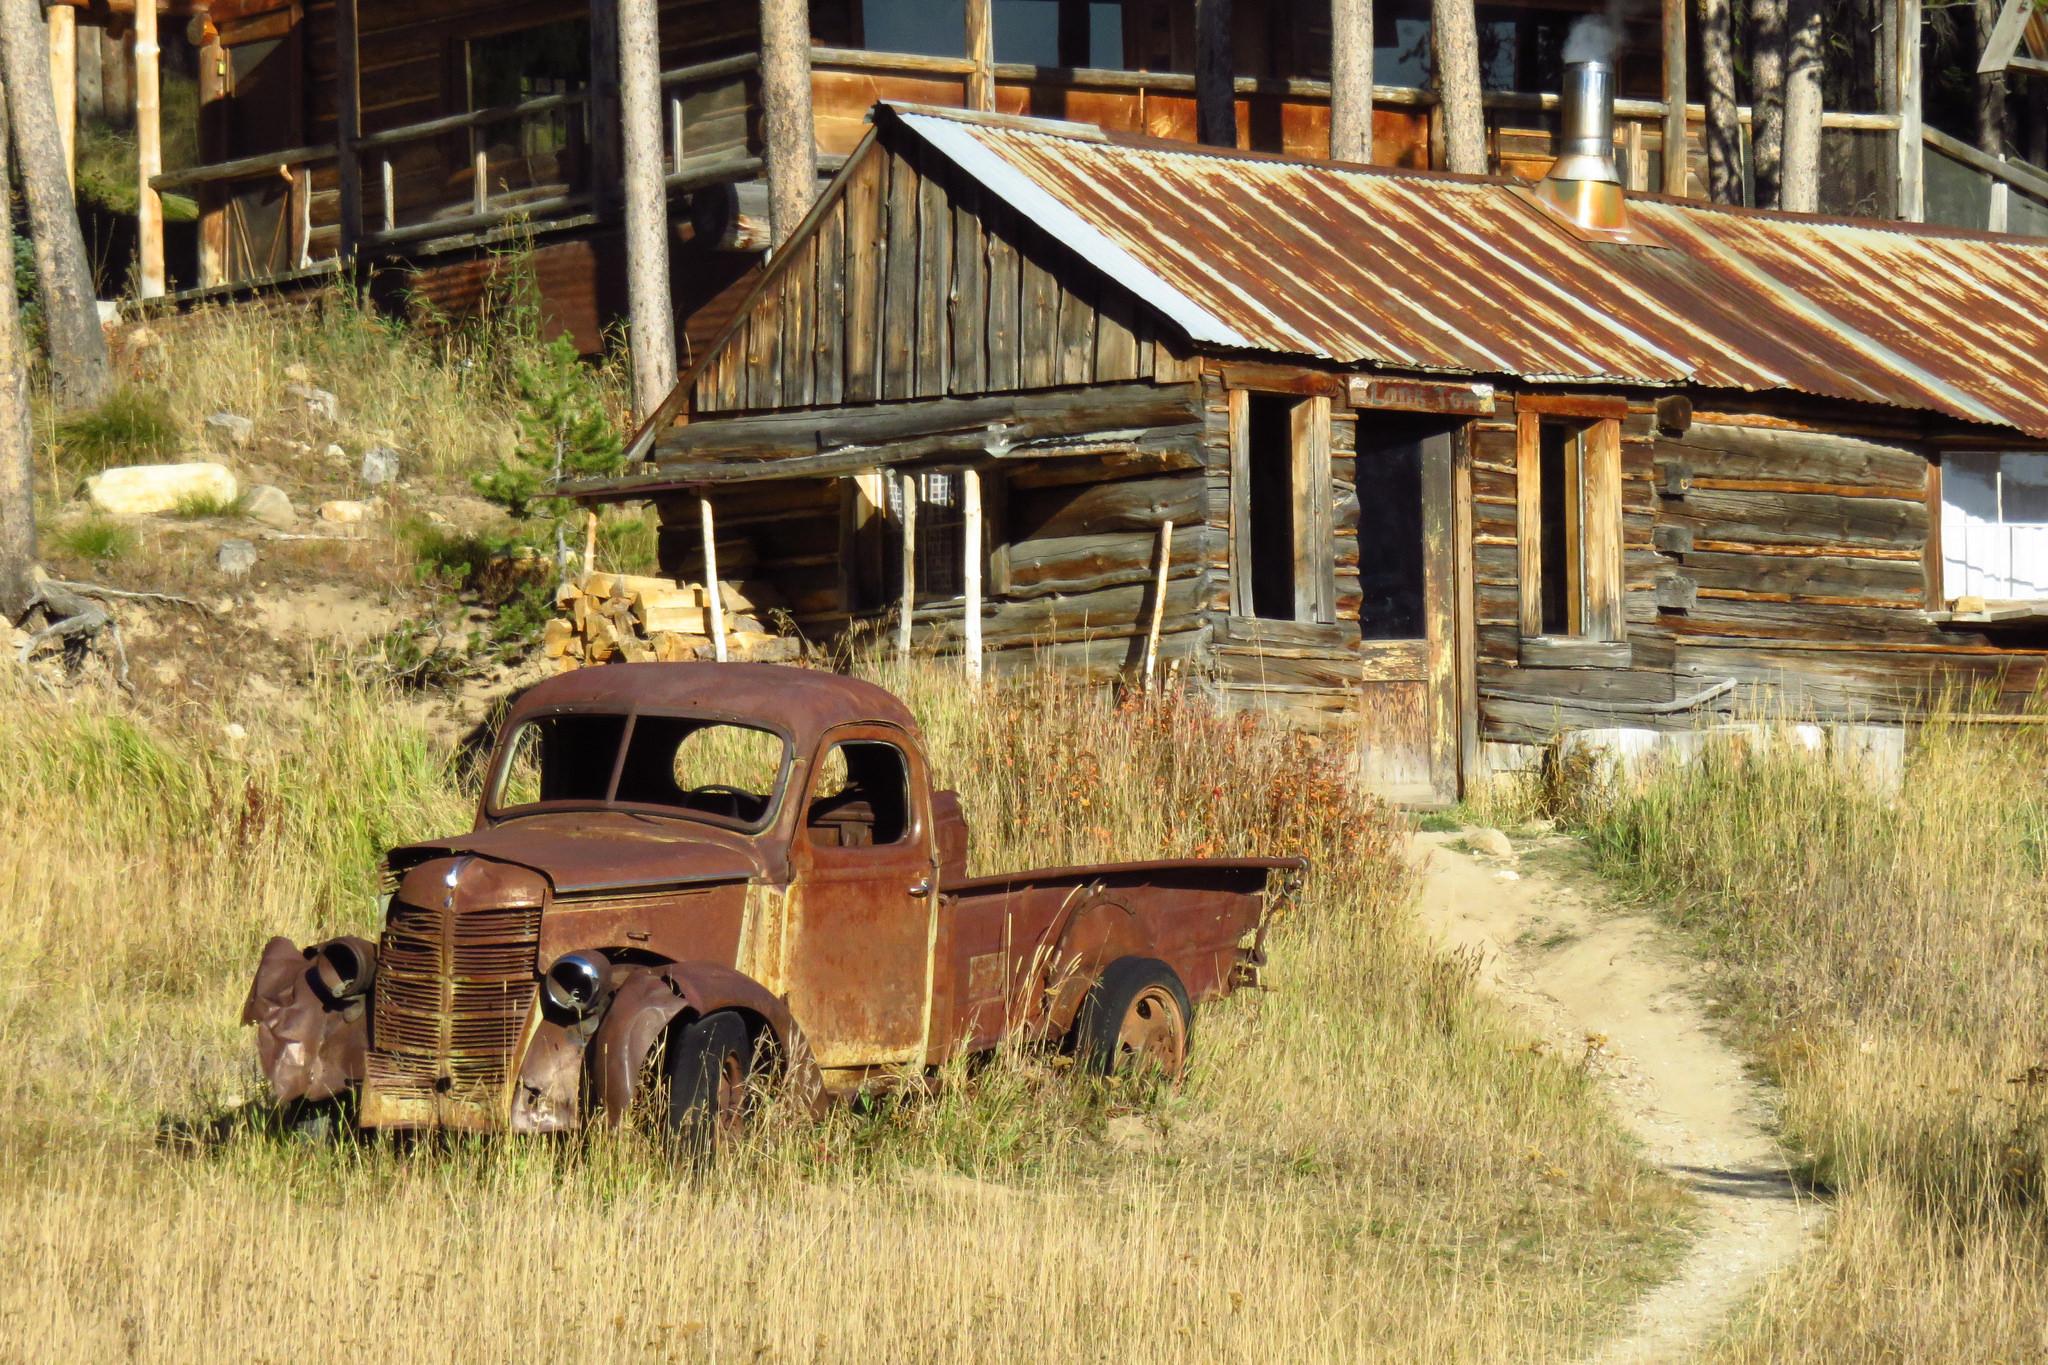 7 Legendary Lost Treasures Buried in Idaho